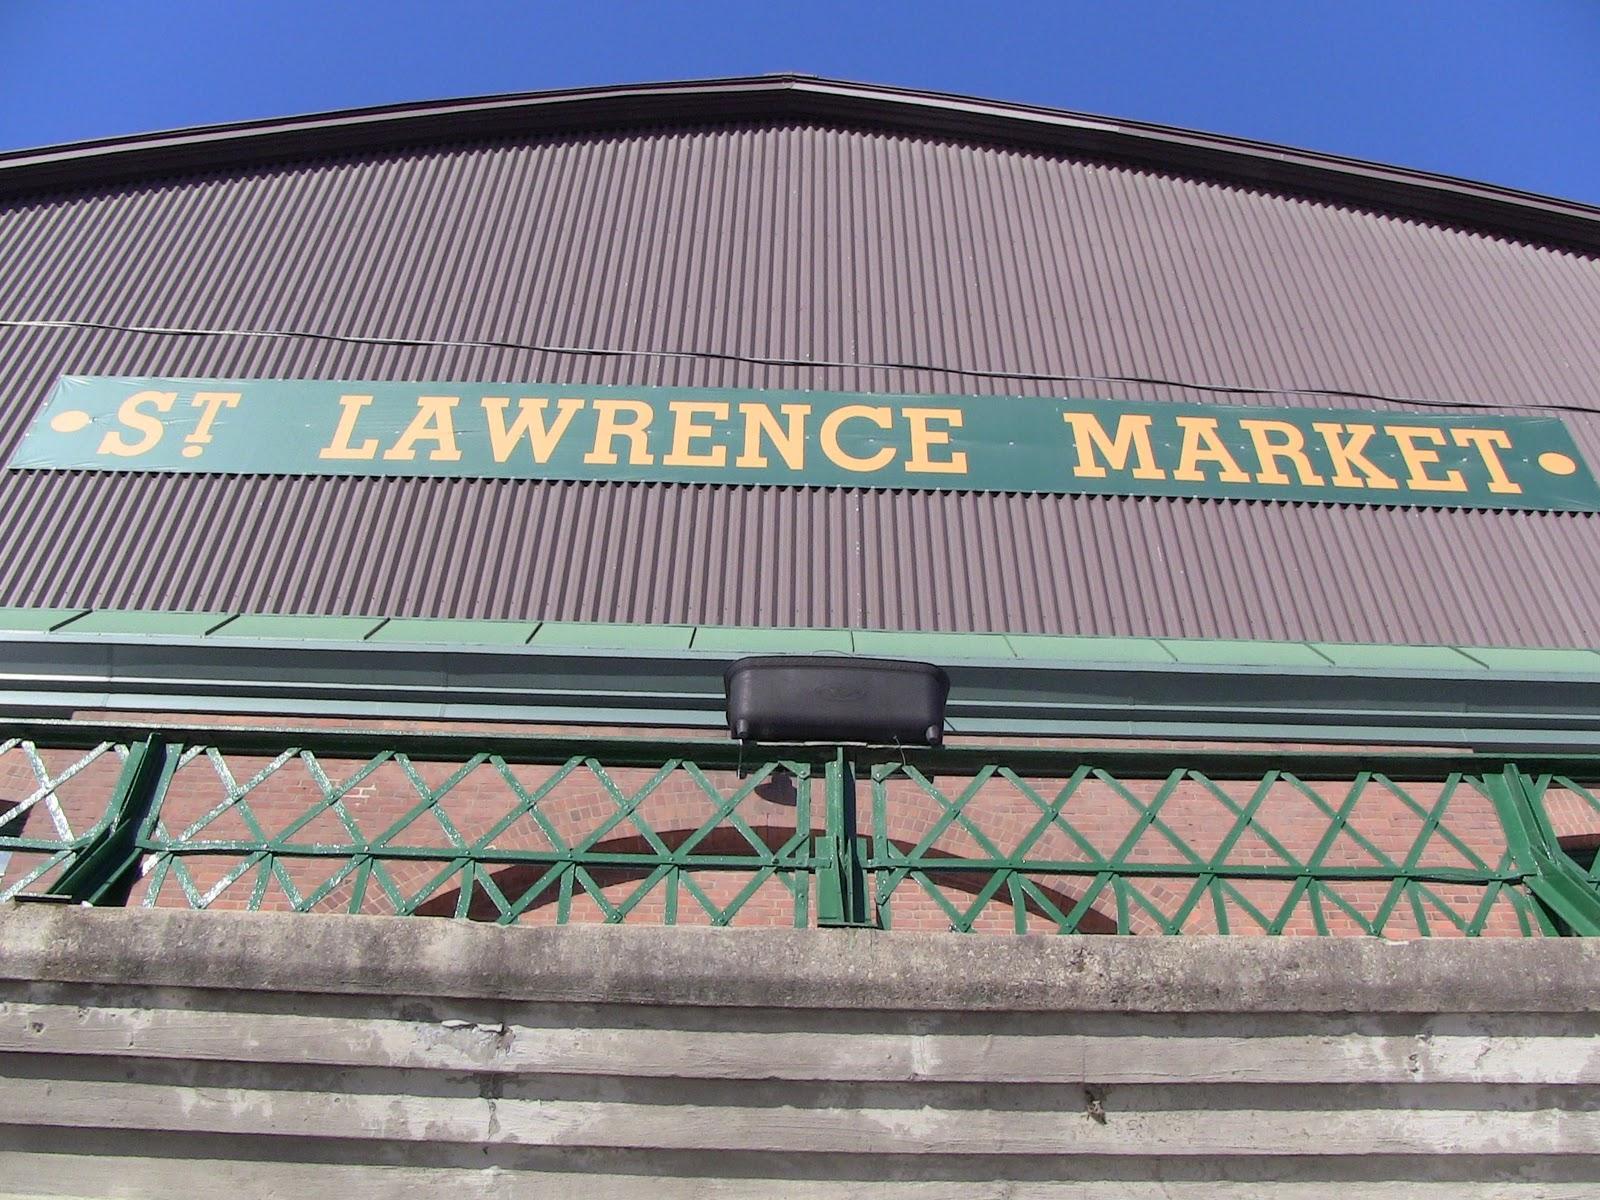 St Lawrence Market Kitchens